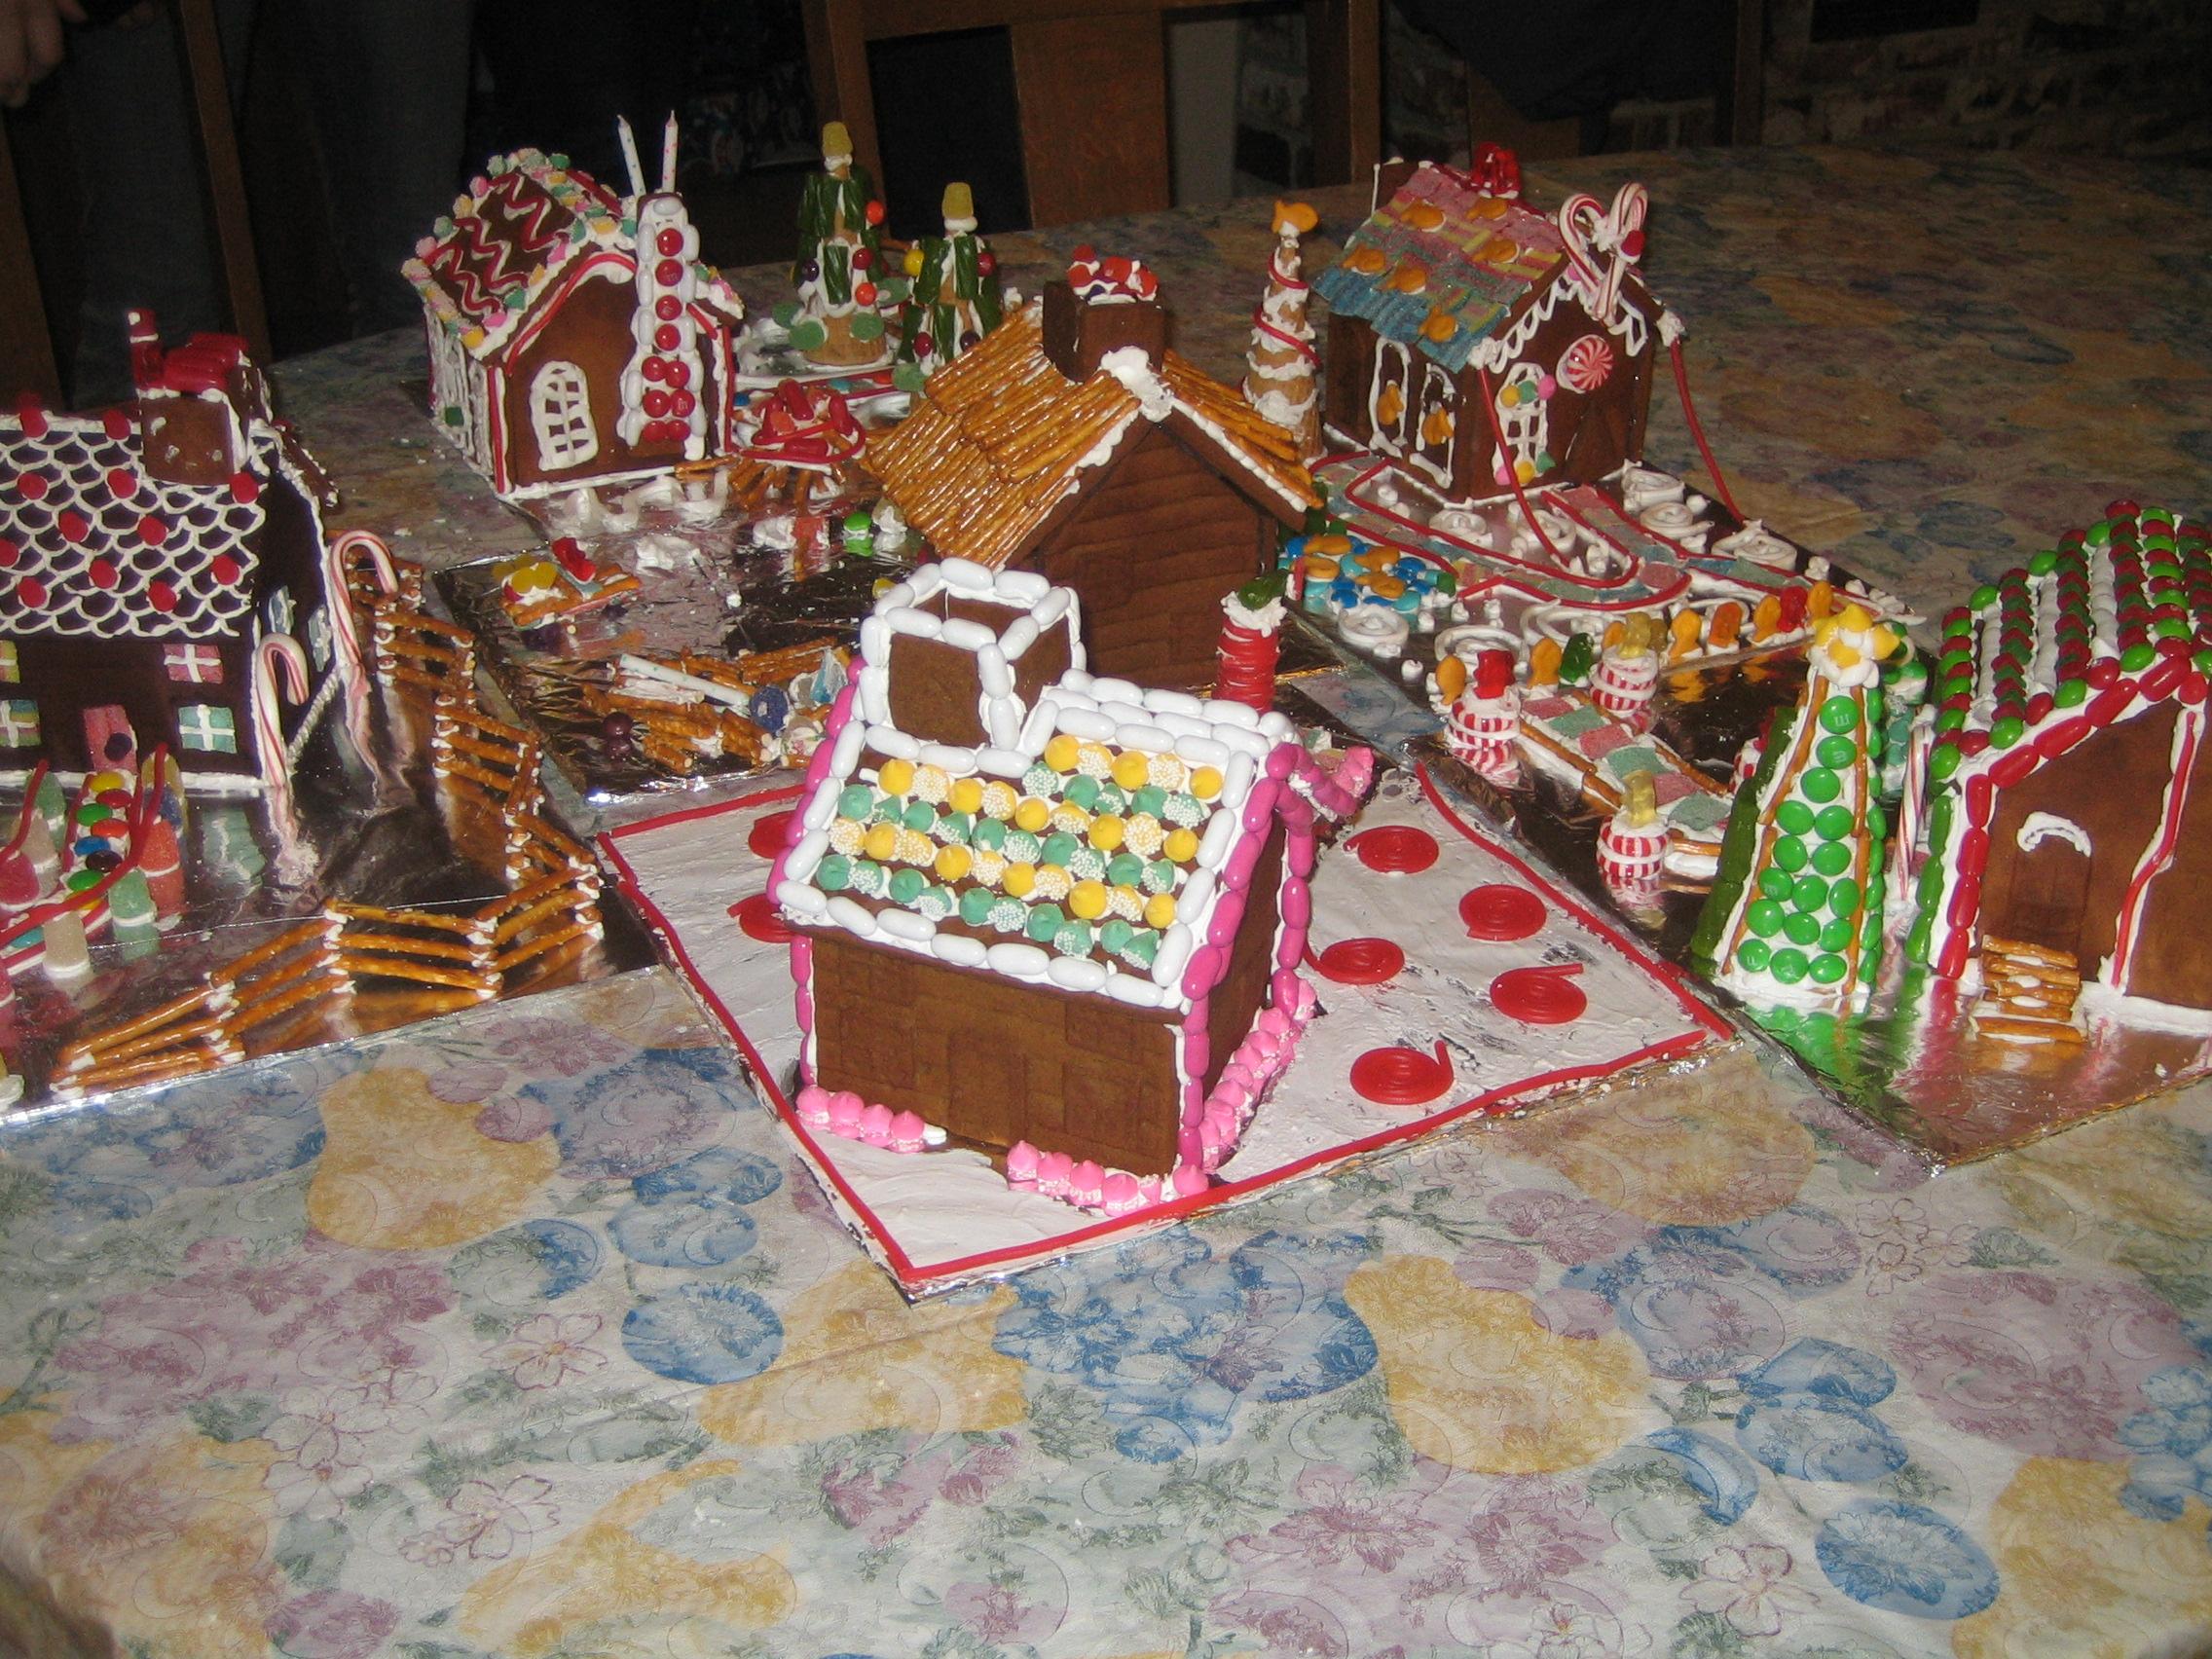 Gingerbread house village-1.JPG